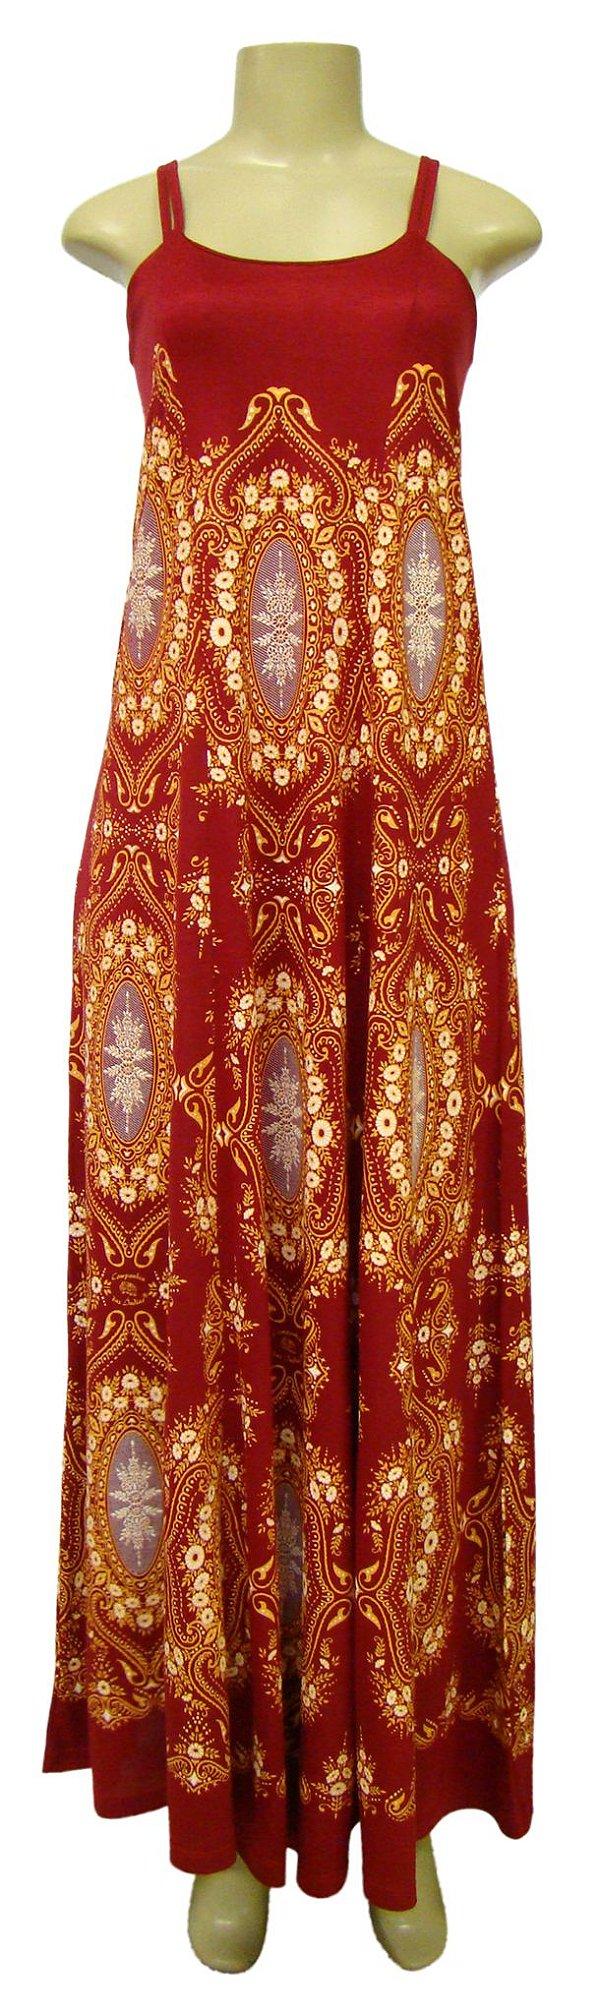 Vestido Longo Dupla Alça - Voluta